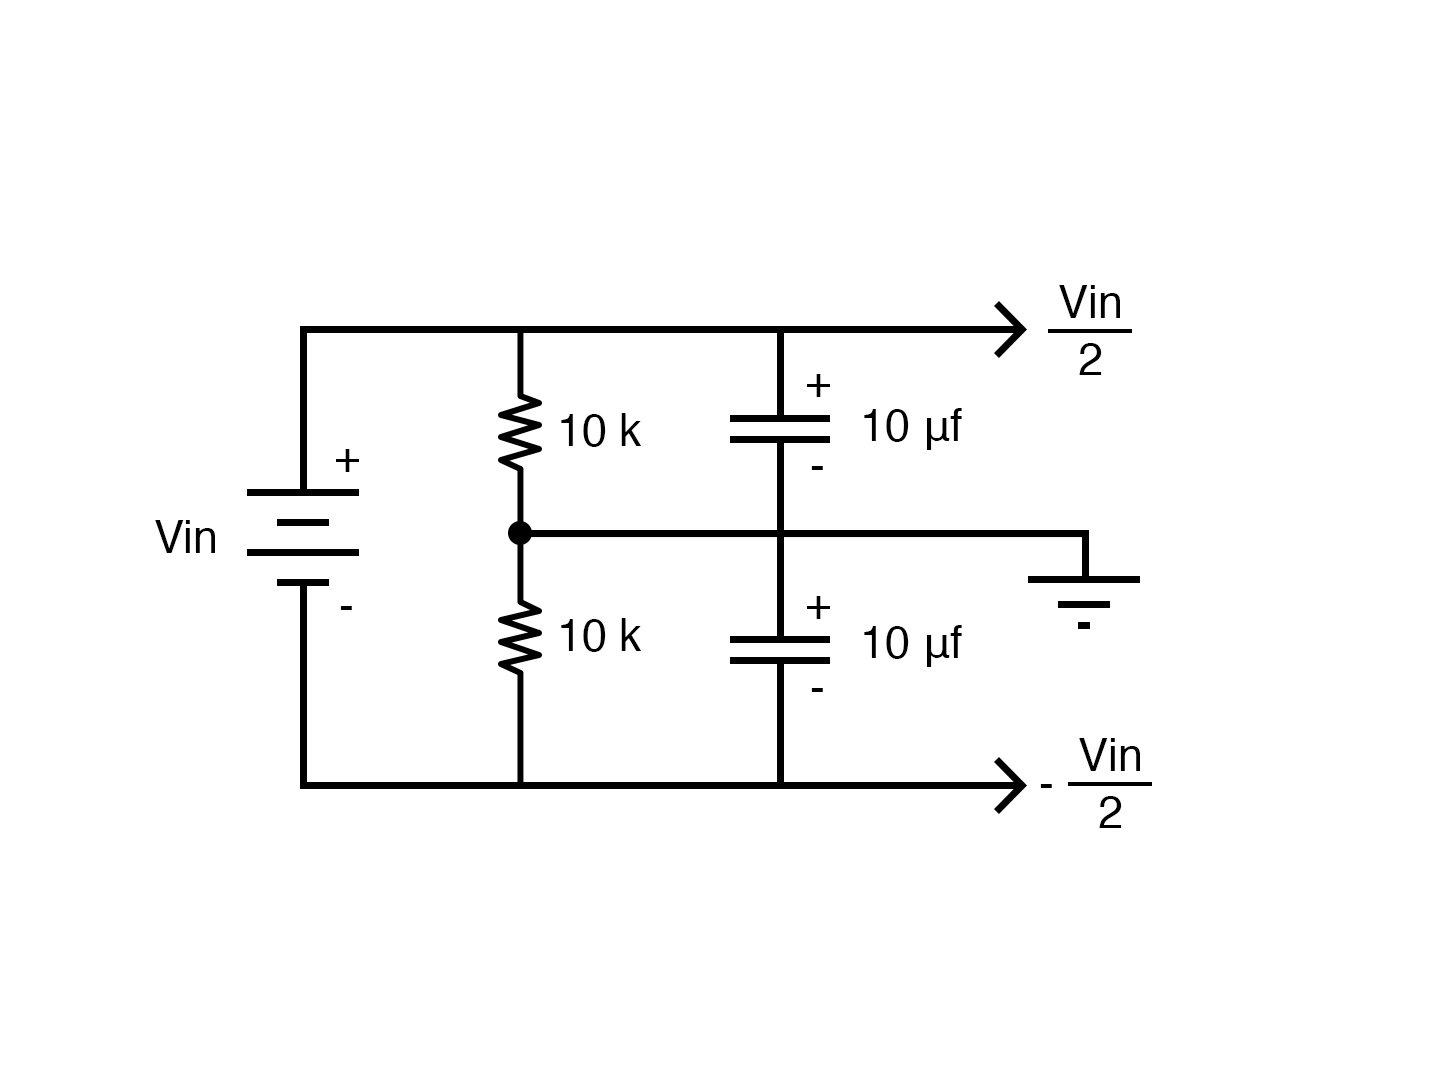 Negative_Voltage_Power_DP_MP_image4.jpg